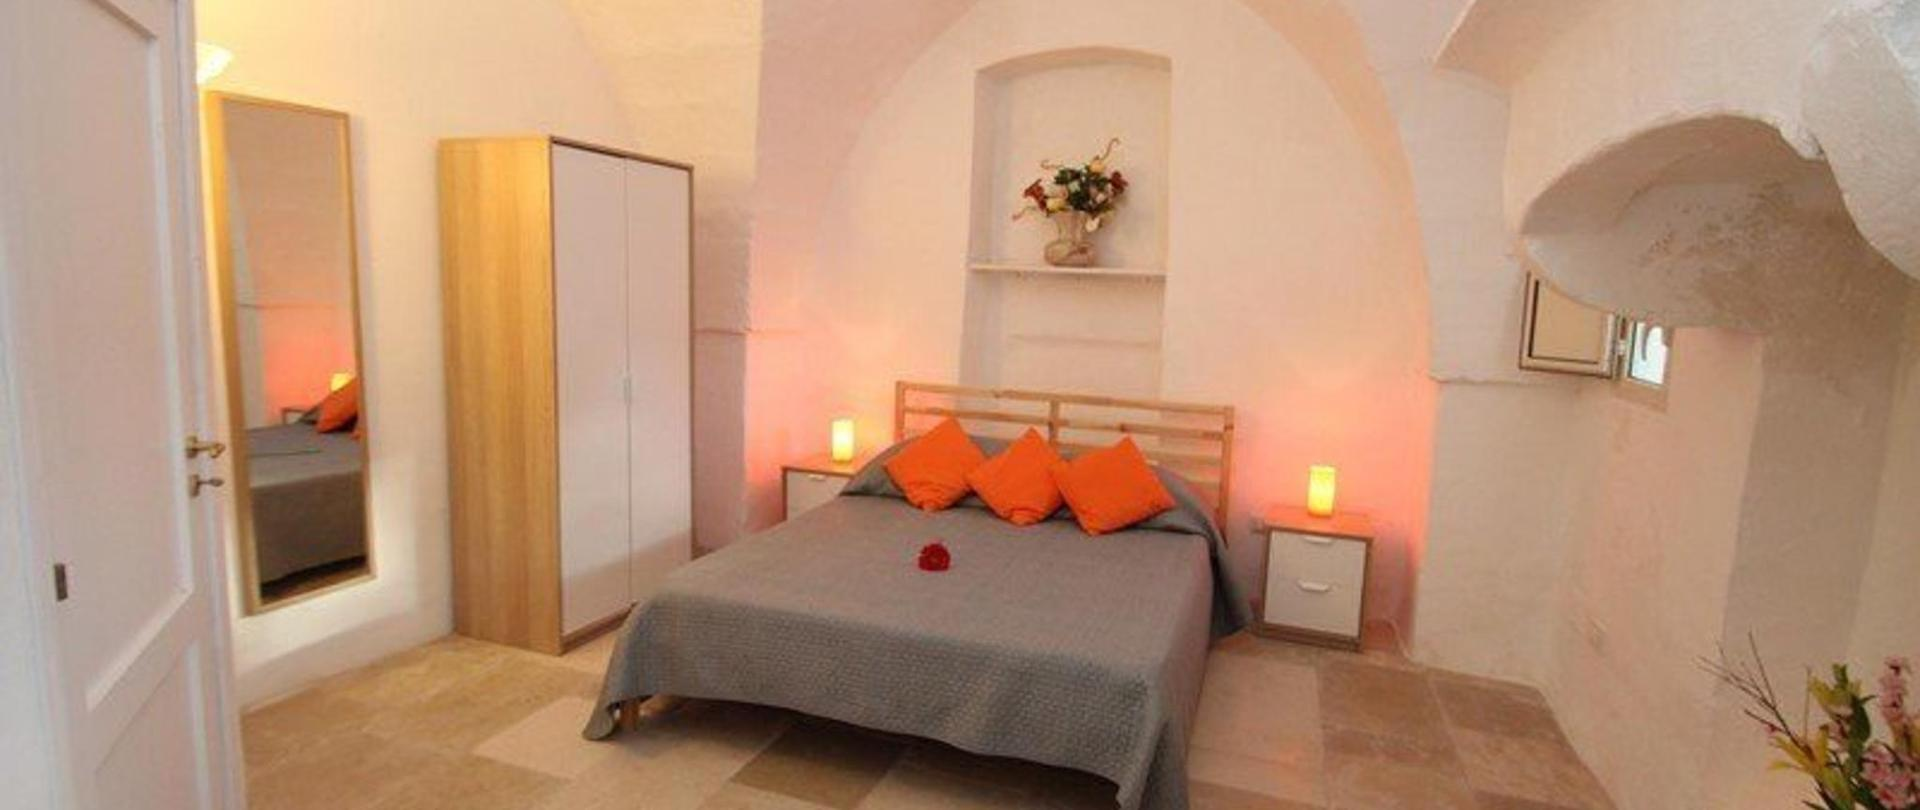 masseria-pugliese-apt-sabia-bedroom1a-1.JPG